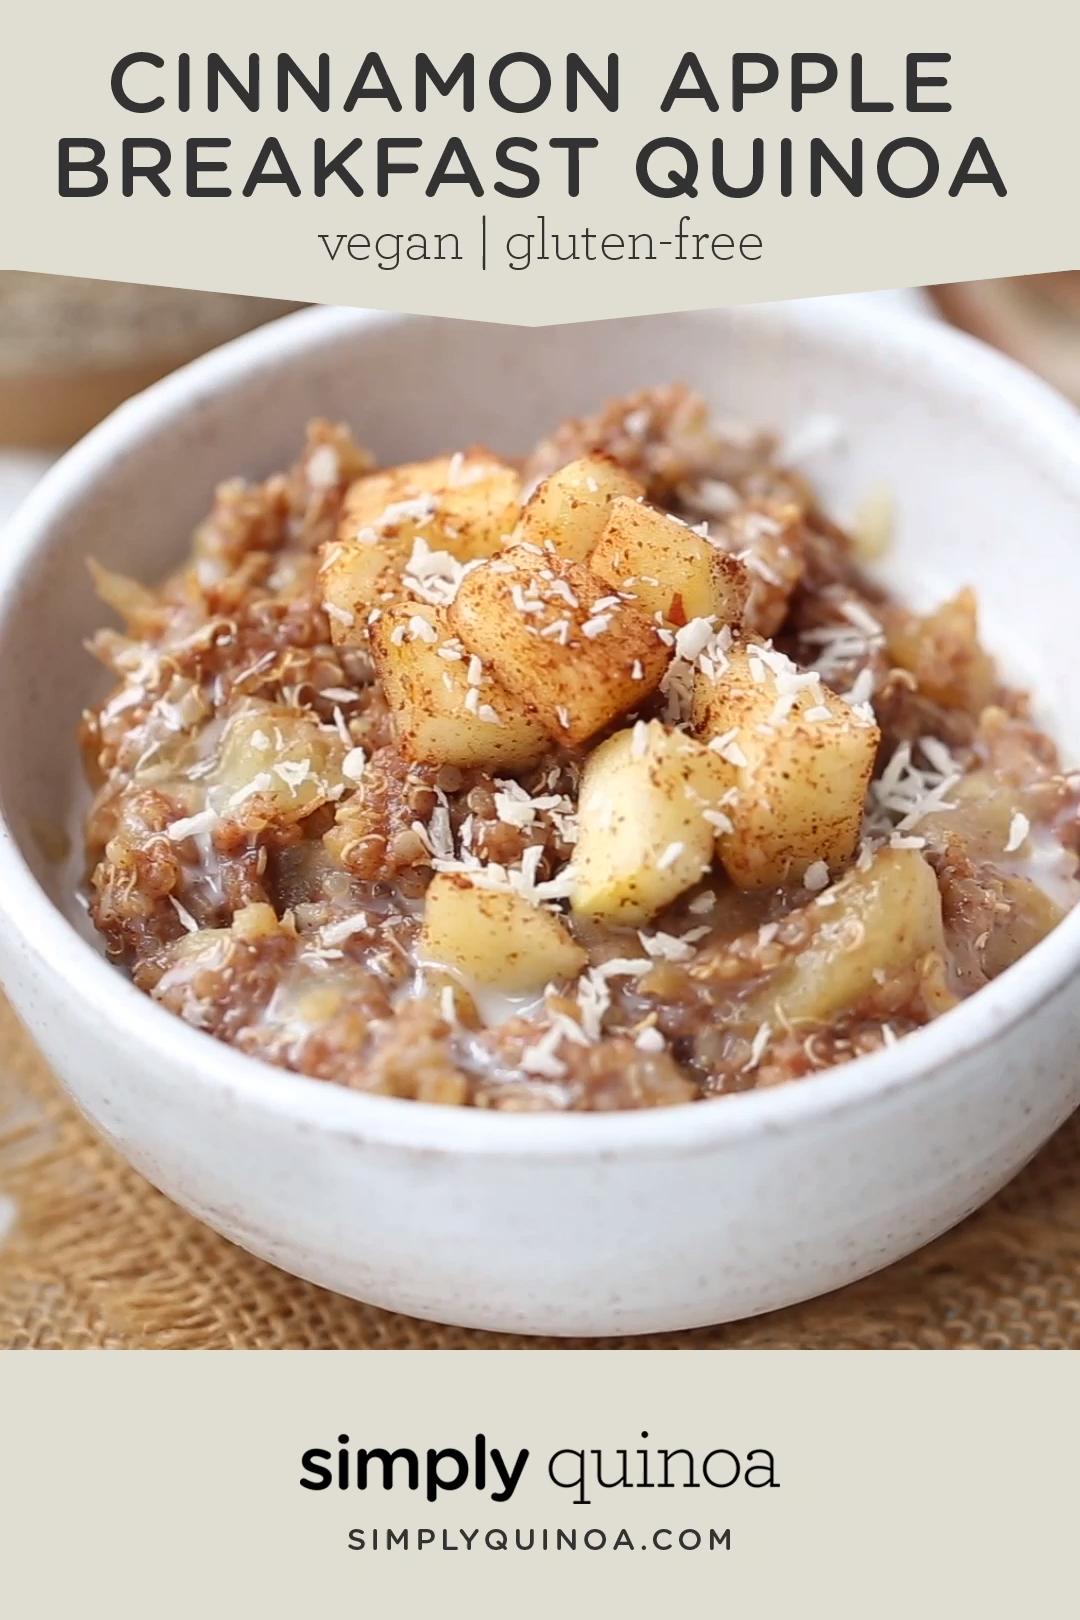 Zimt-Apfel-Frühstücks-Quinoa - New Ideas #glutenfreebreakfasts